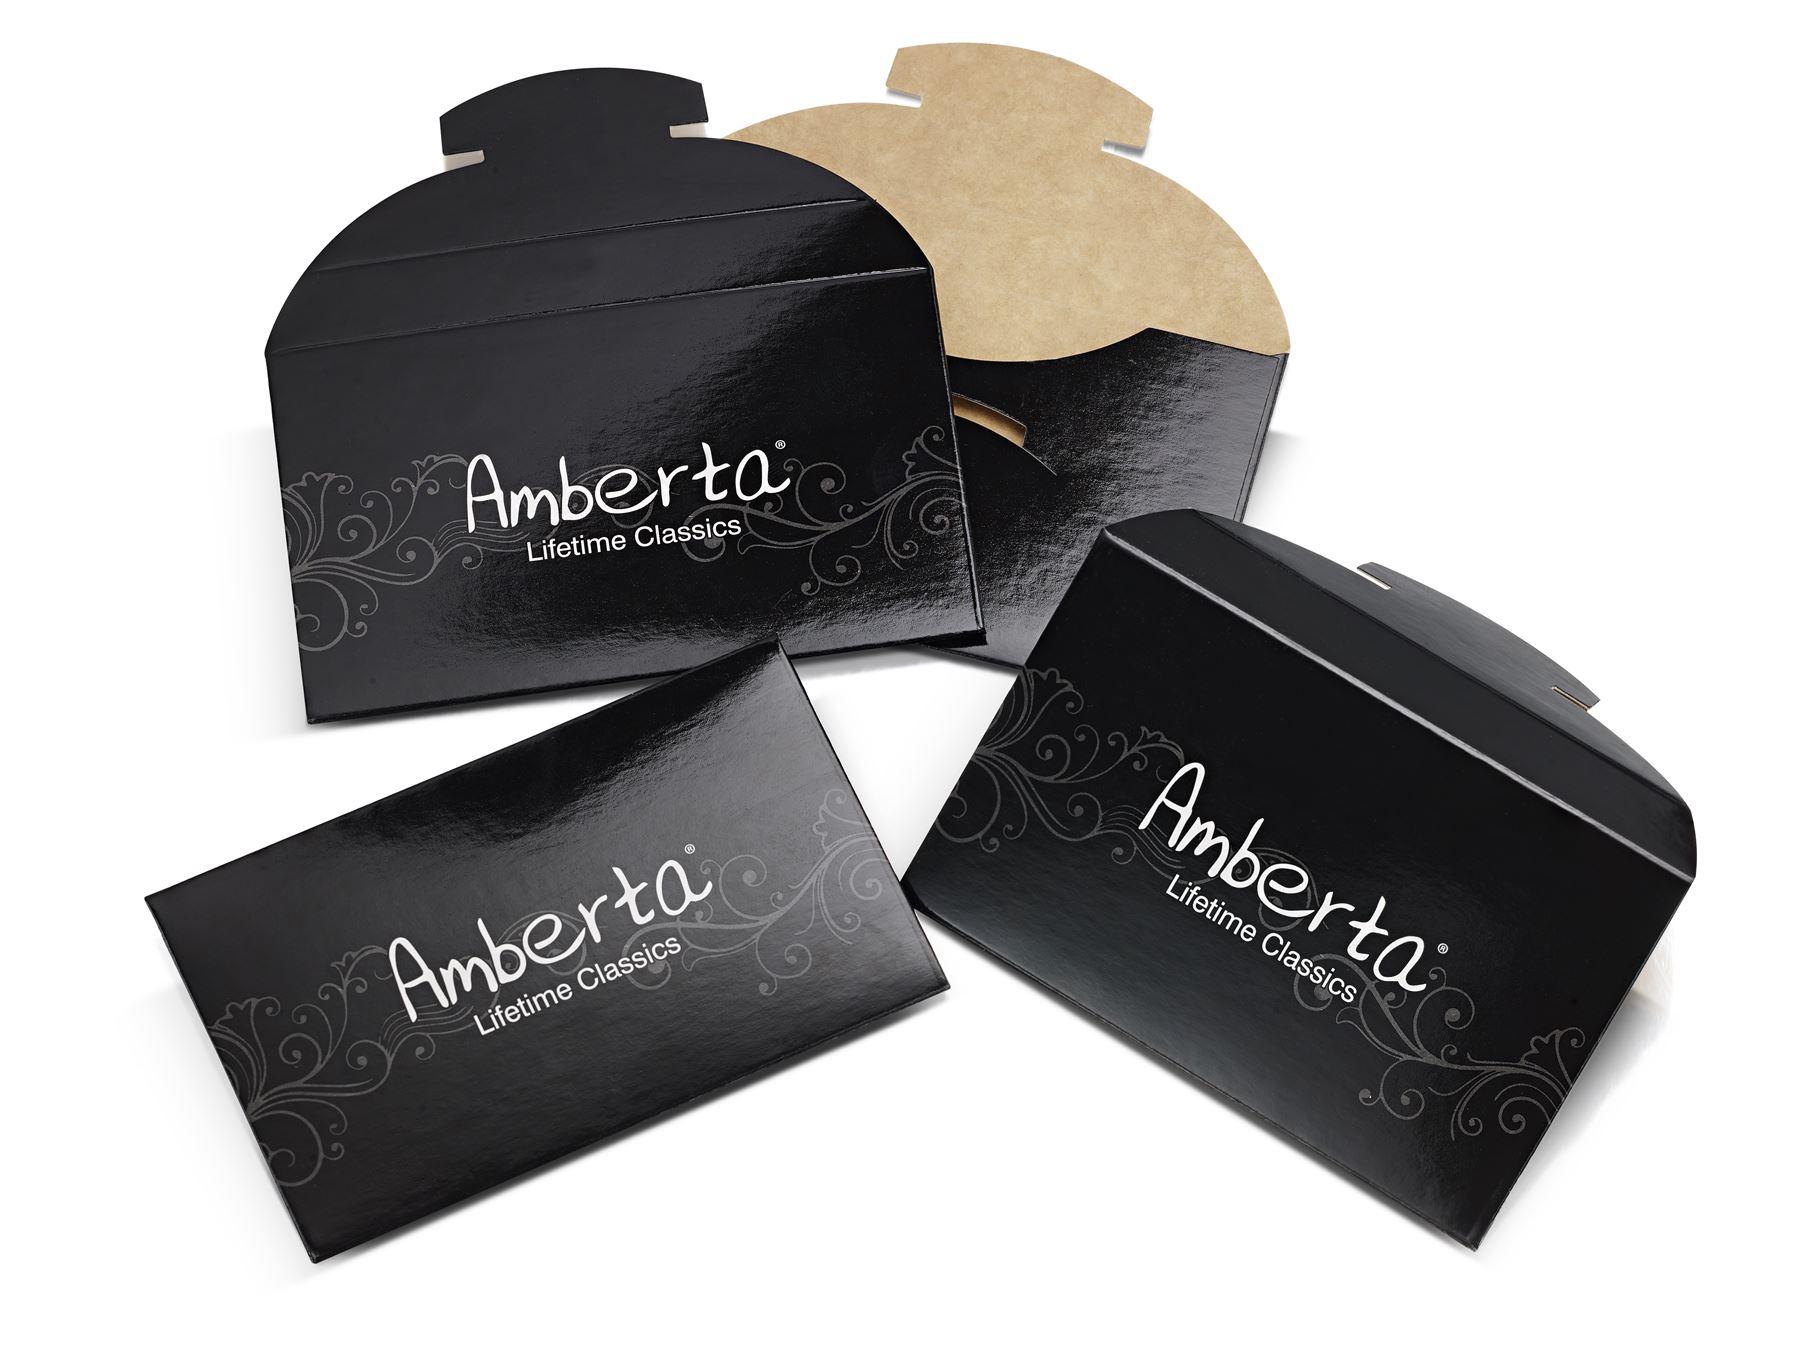 Amberta-Jewelry-925-Sterling-Silver-Adjustable-Anklet-Foot-Bracelet-for-Women miniature 31